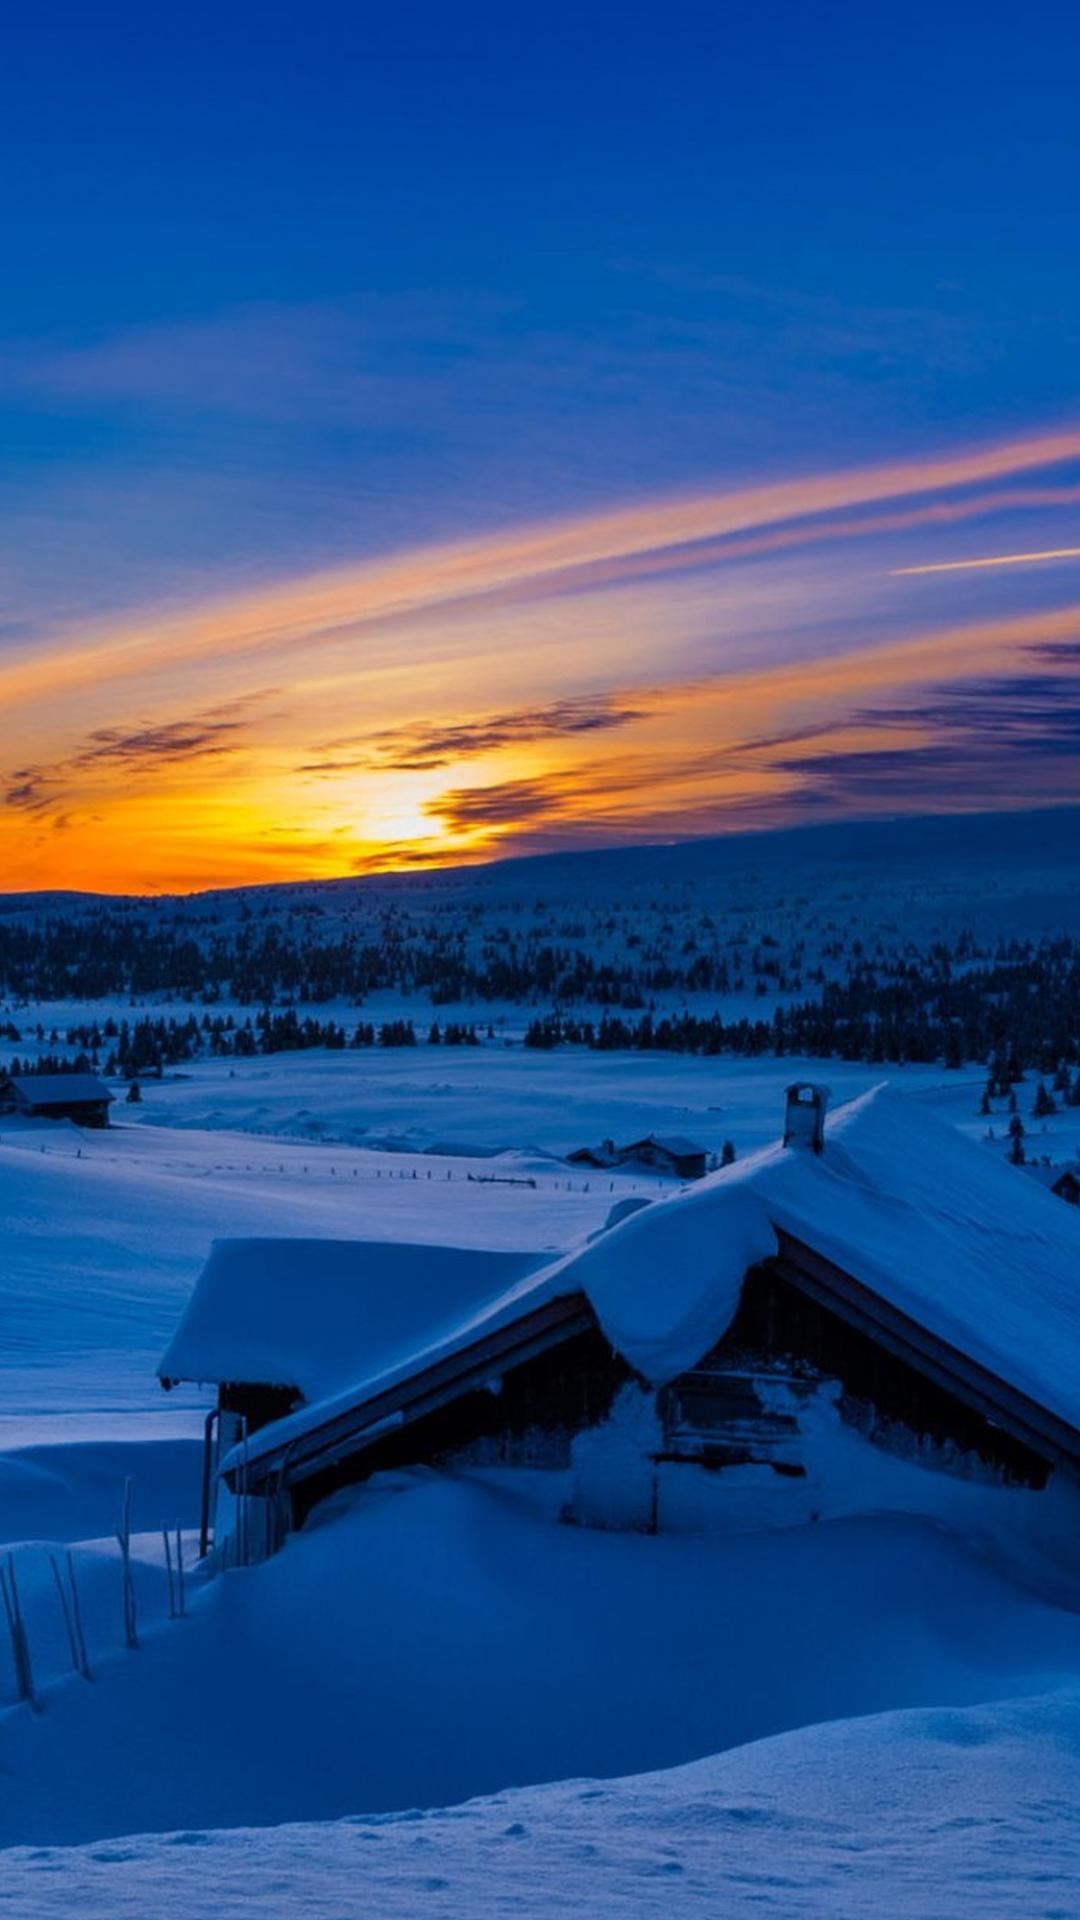 Beautiful Sunset Winter Chalet Snow iPhone 6 Plus HD Wallpaper iPod 1080x1920